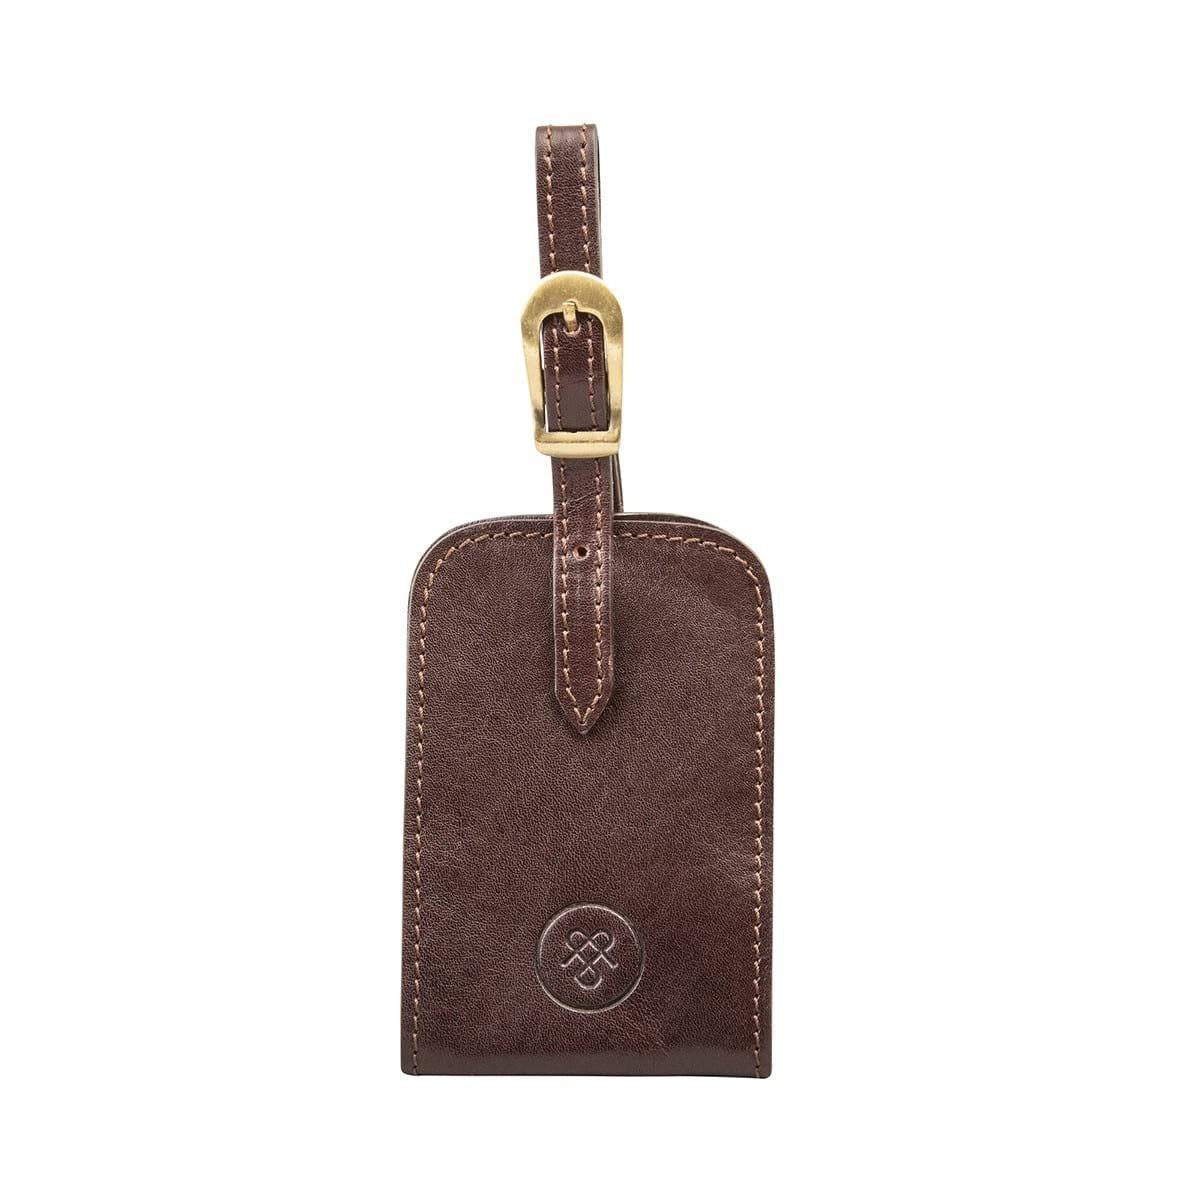 Maxwell-Scott Premium Dark Chocolate Brown Leather Bag Tag (The Ledro)